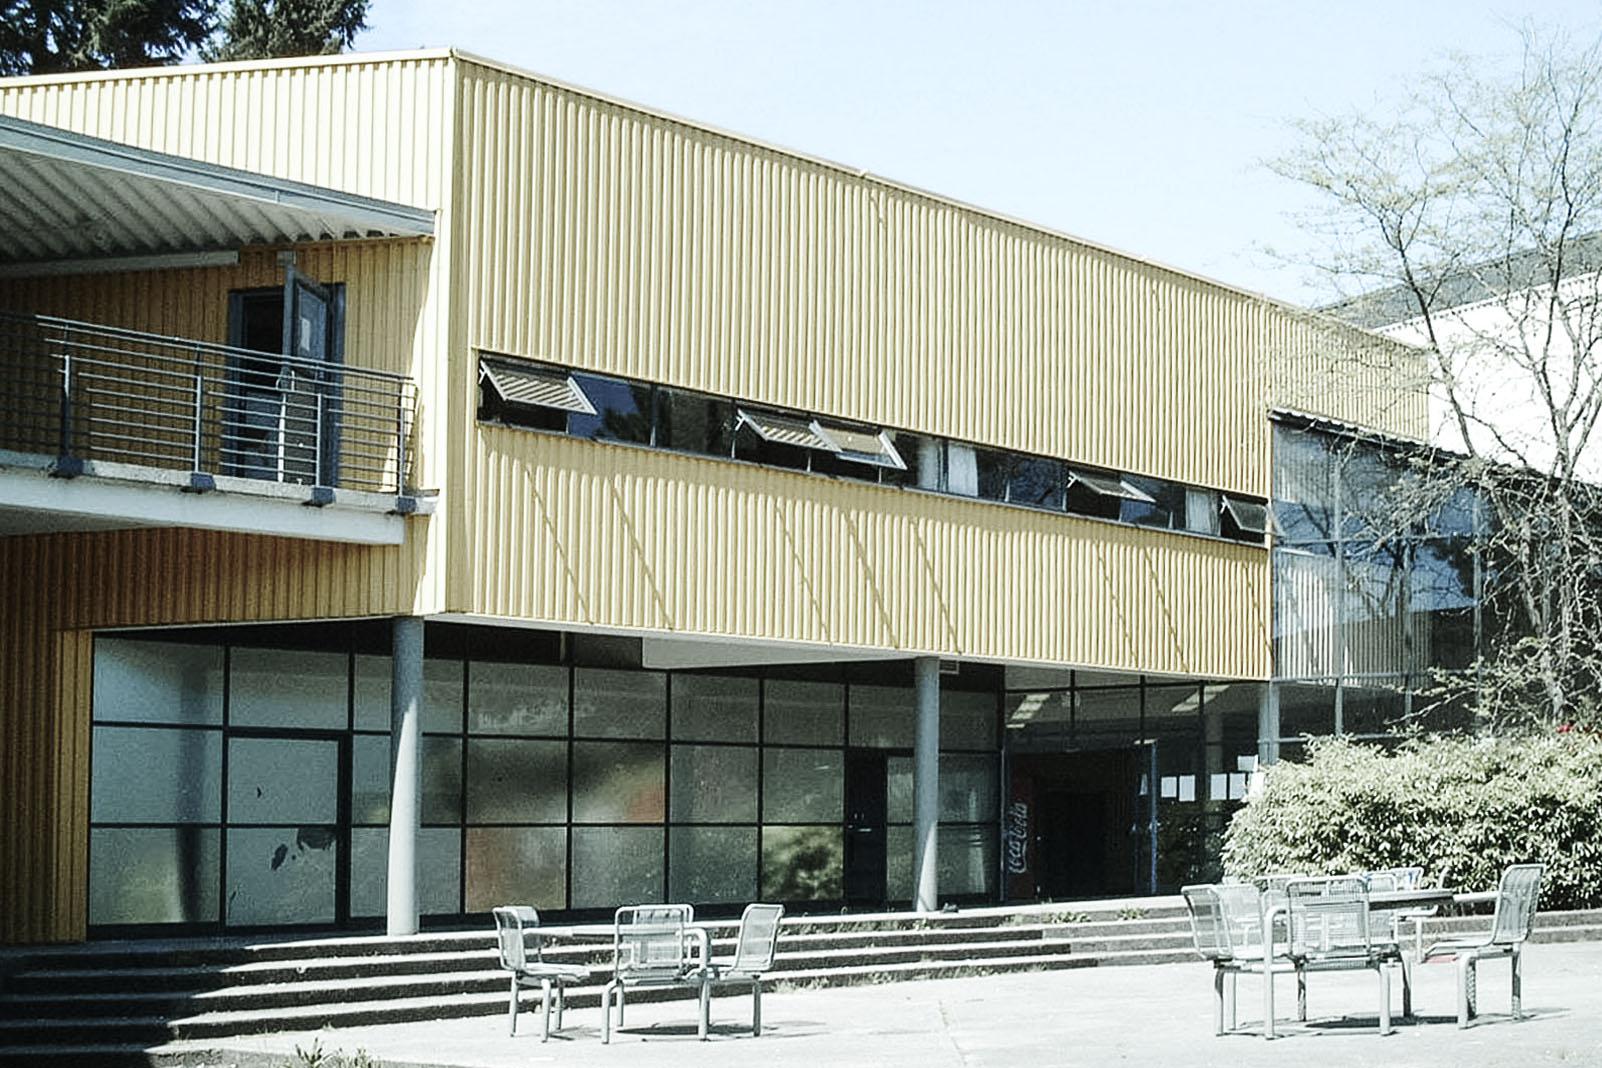 Windsor Secondary School — Before